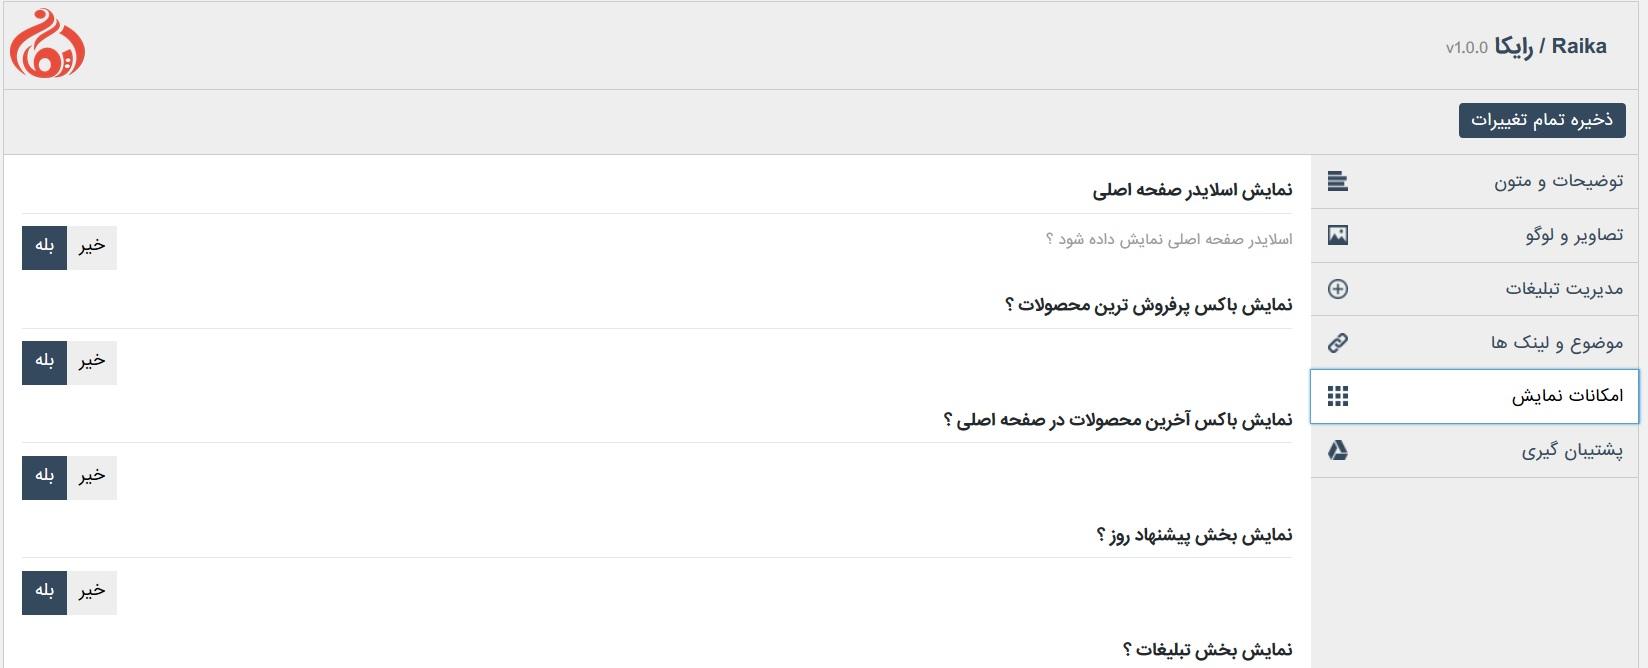 93053 5705b85e6c5e34c492aa5e853 - قالب رایکا پوسته وردپرس فروشگاهی ایرانی   Raika Theme